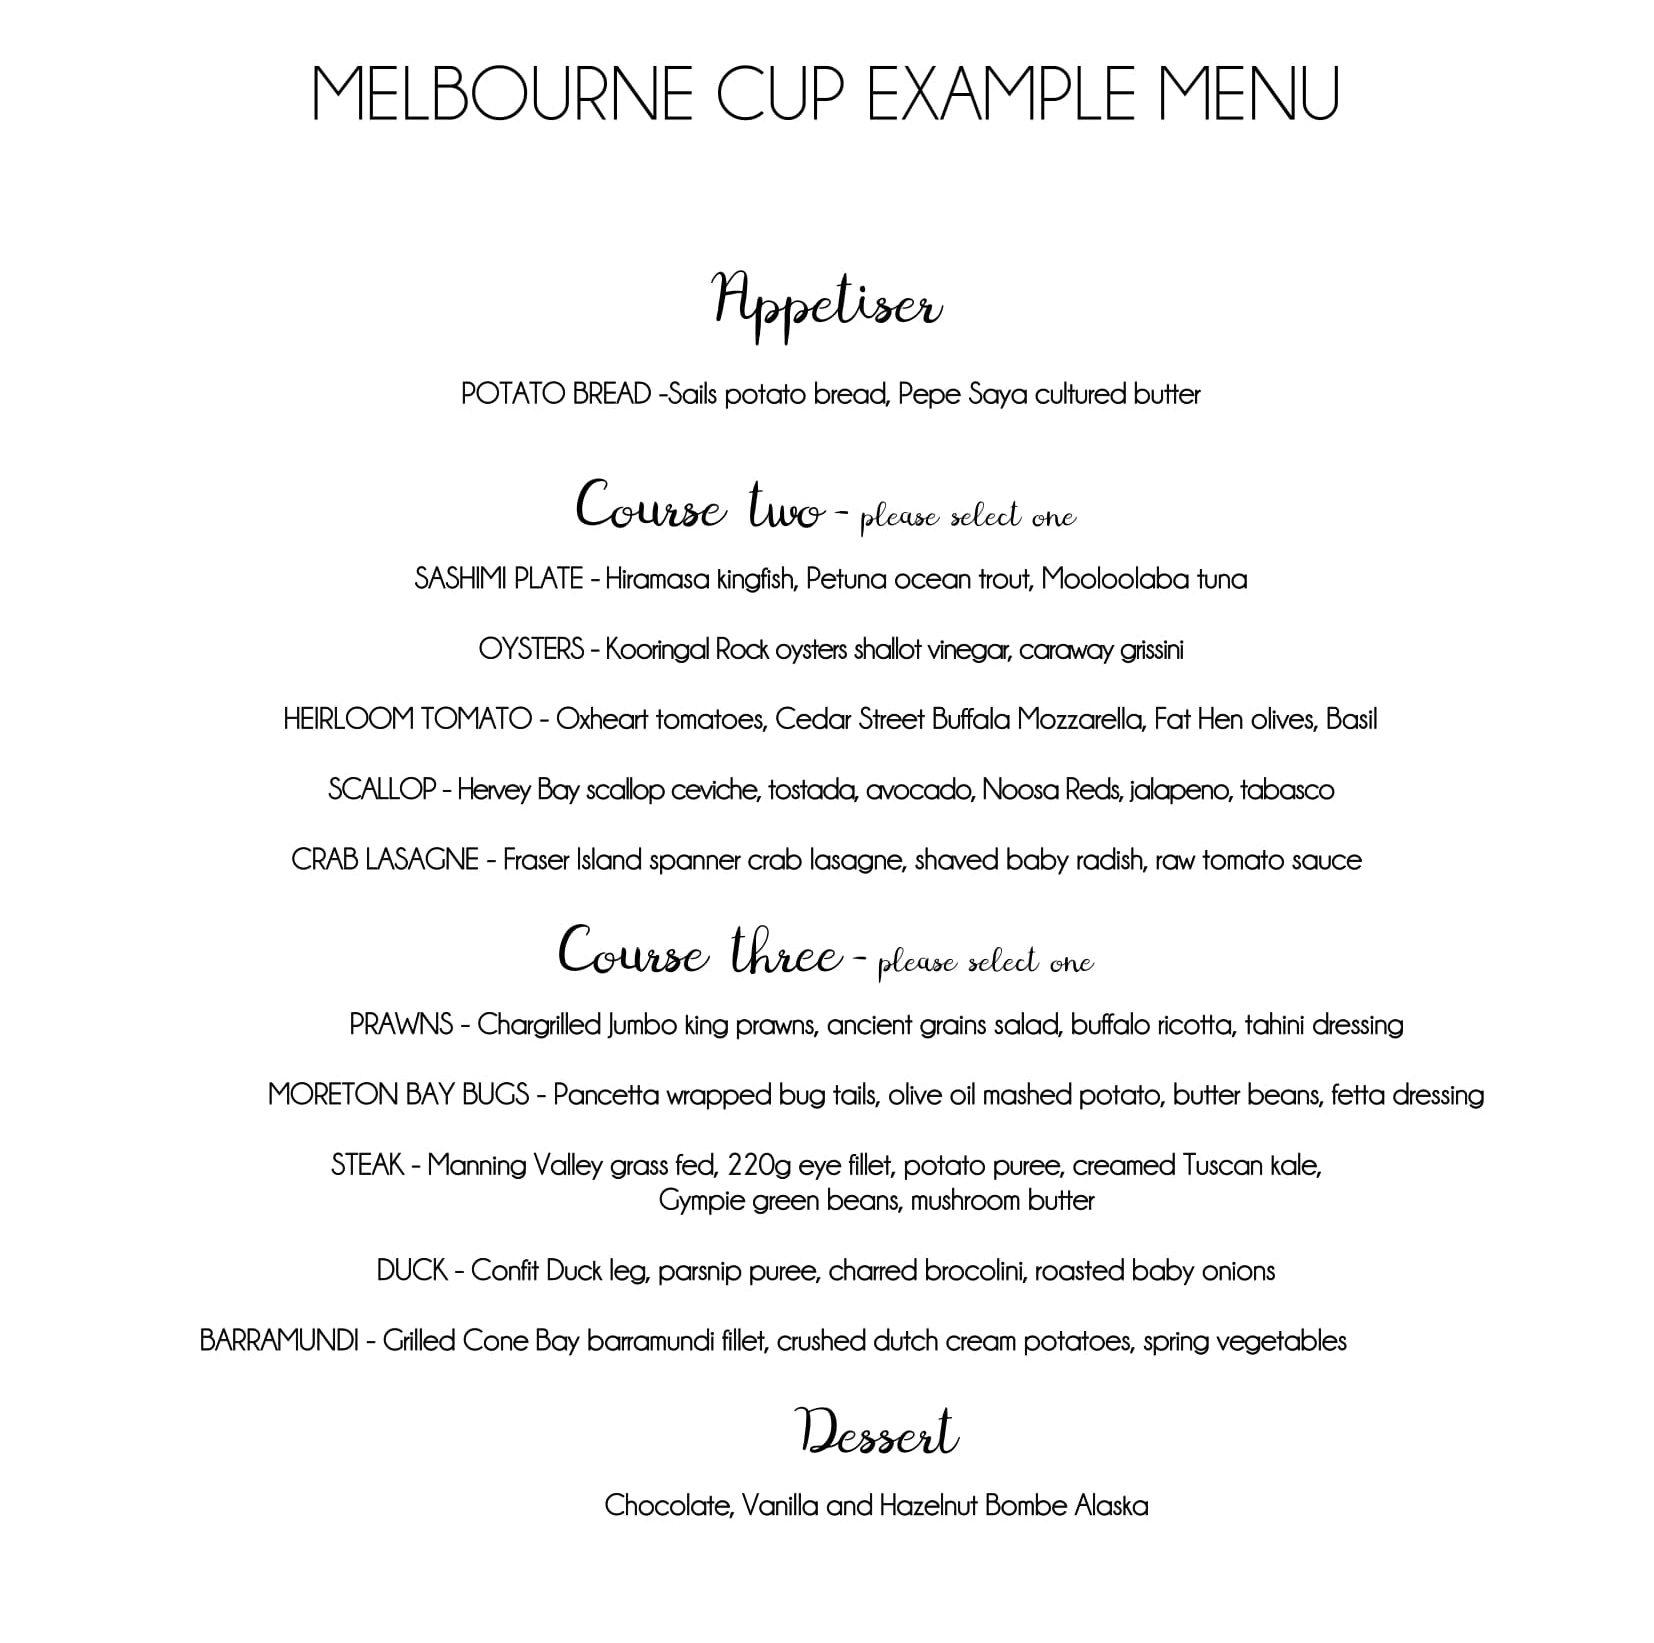 MELBOURNE CUP EXAMPLE MENU 2017-1